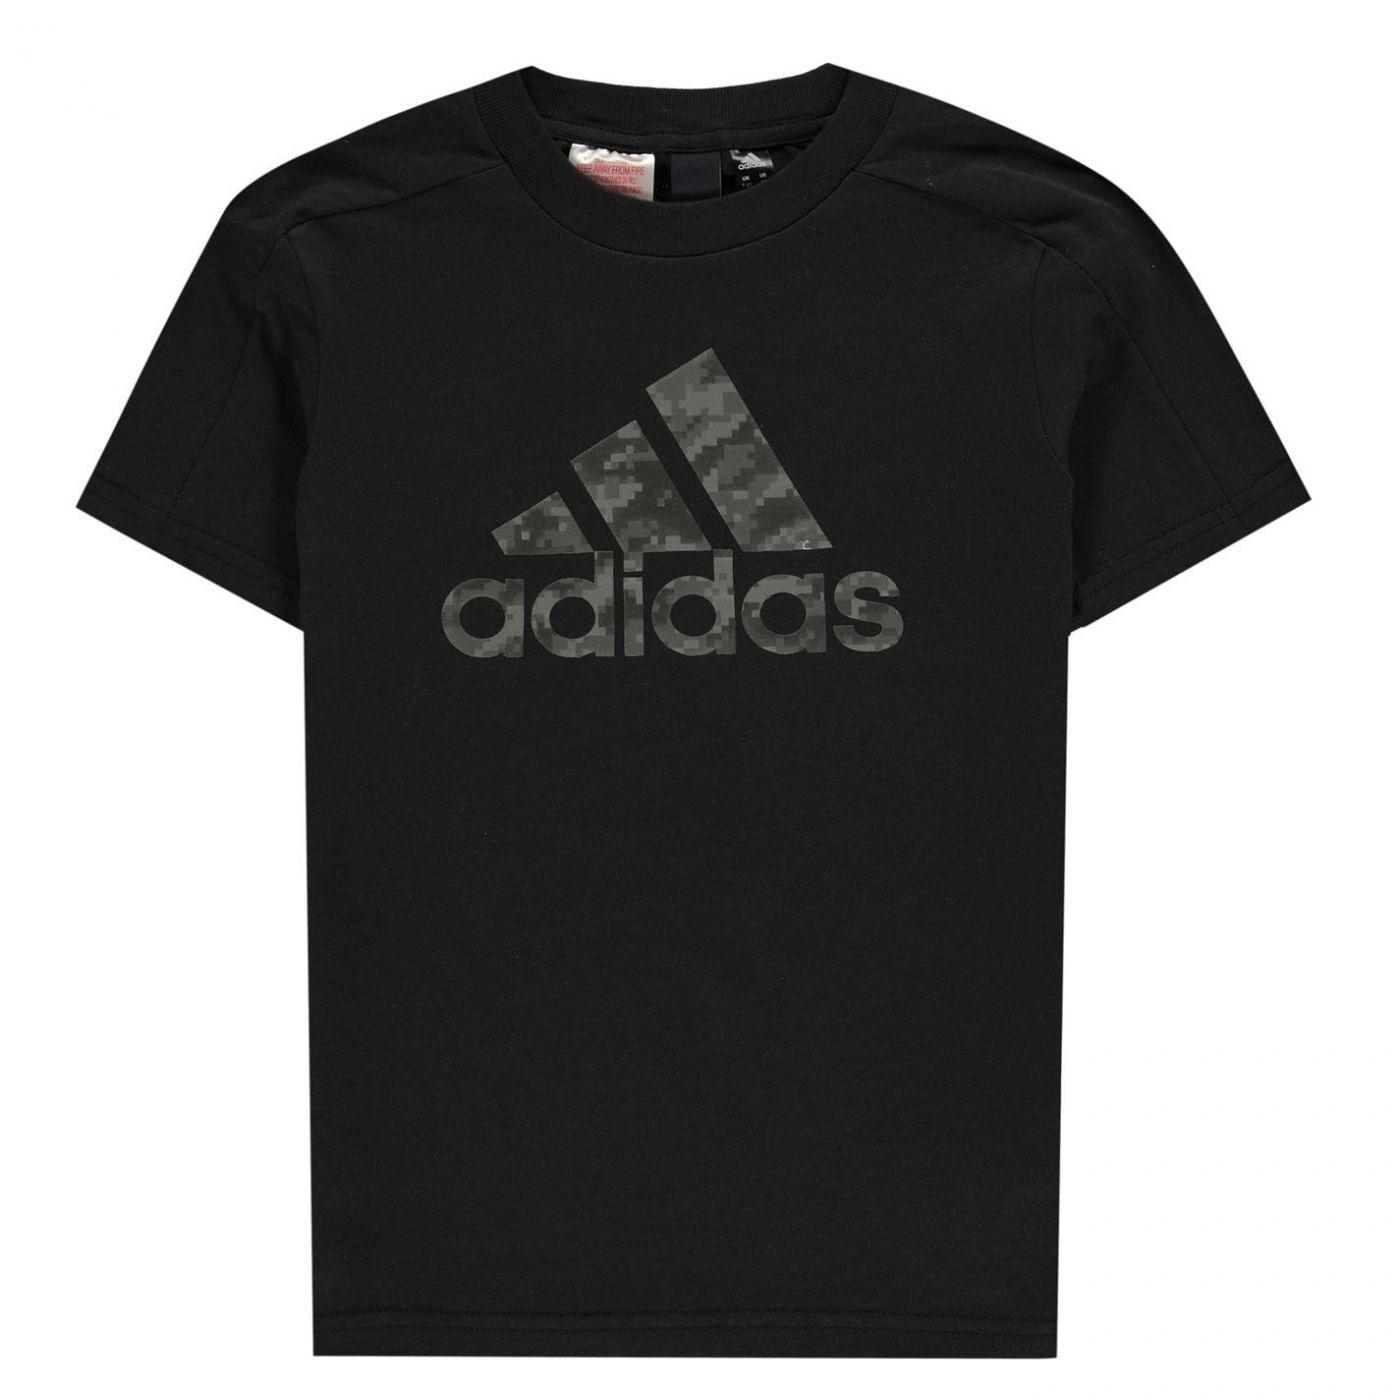 Adidas ID T Shirt Junior Boys